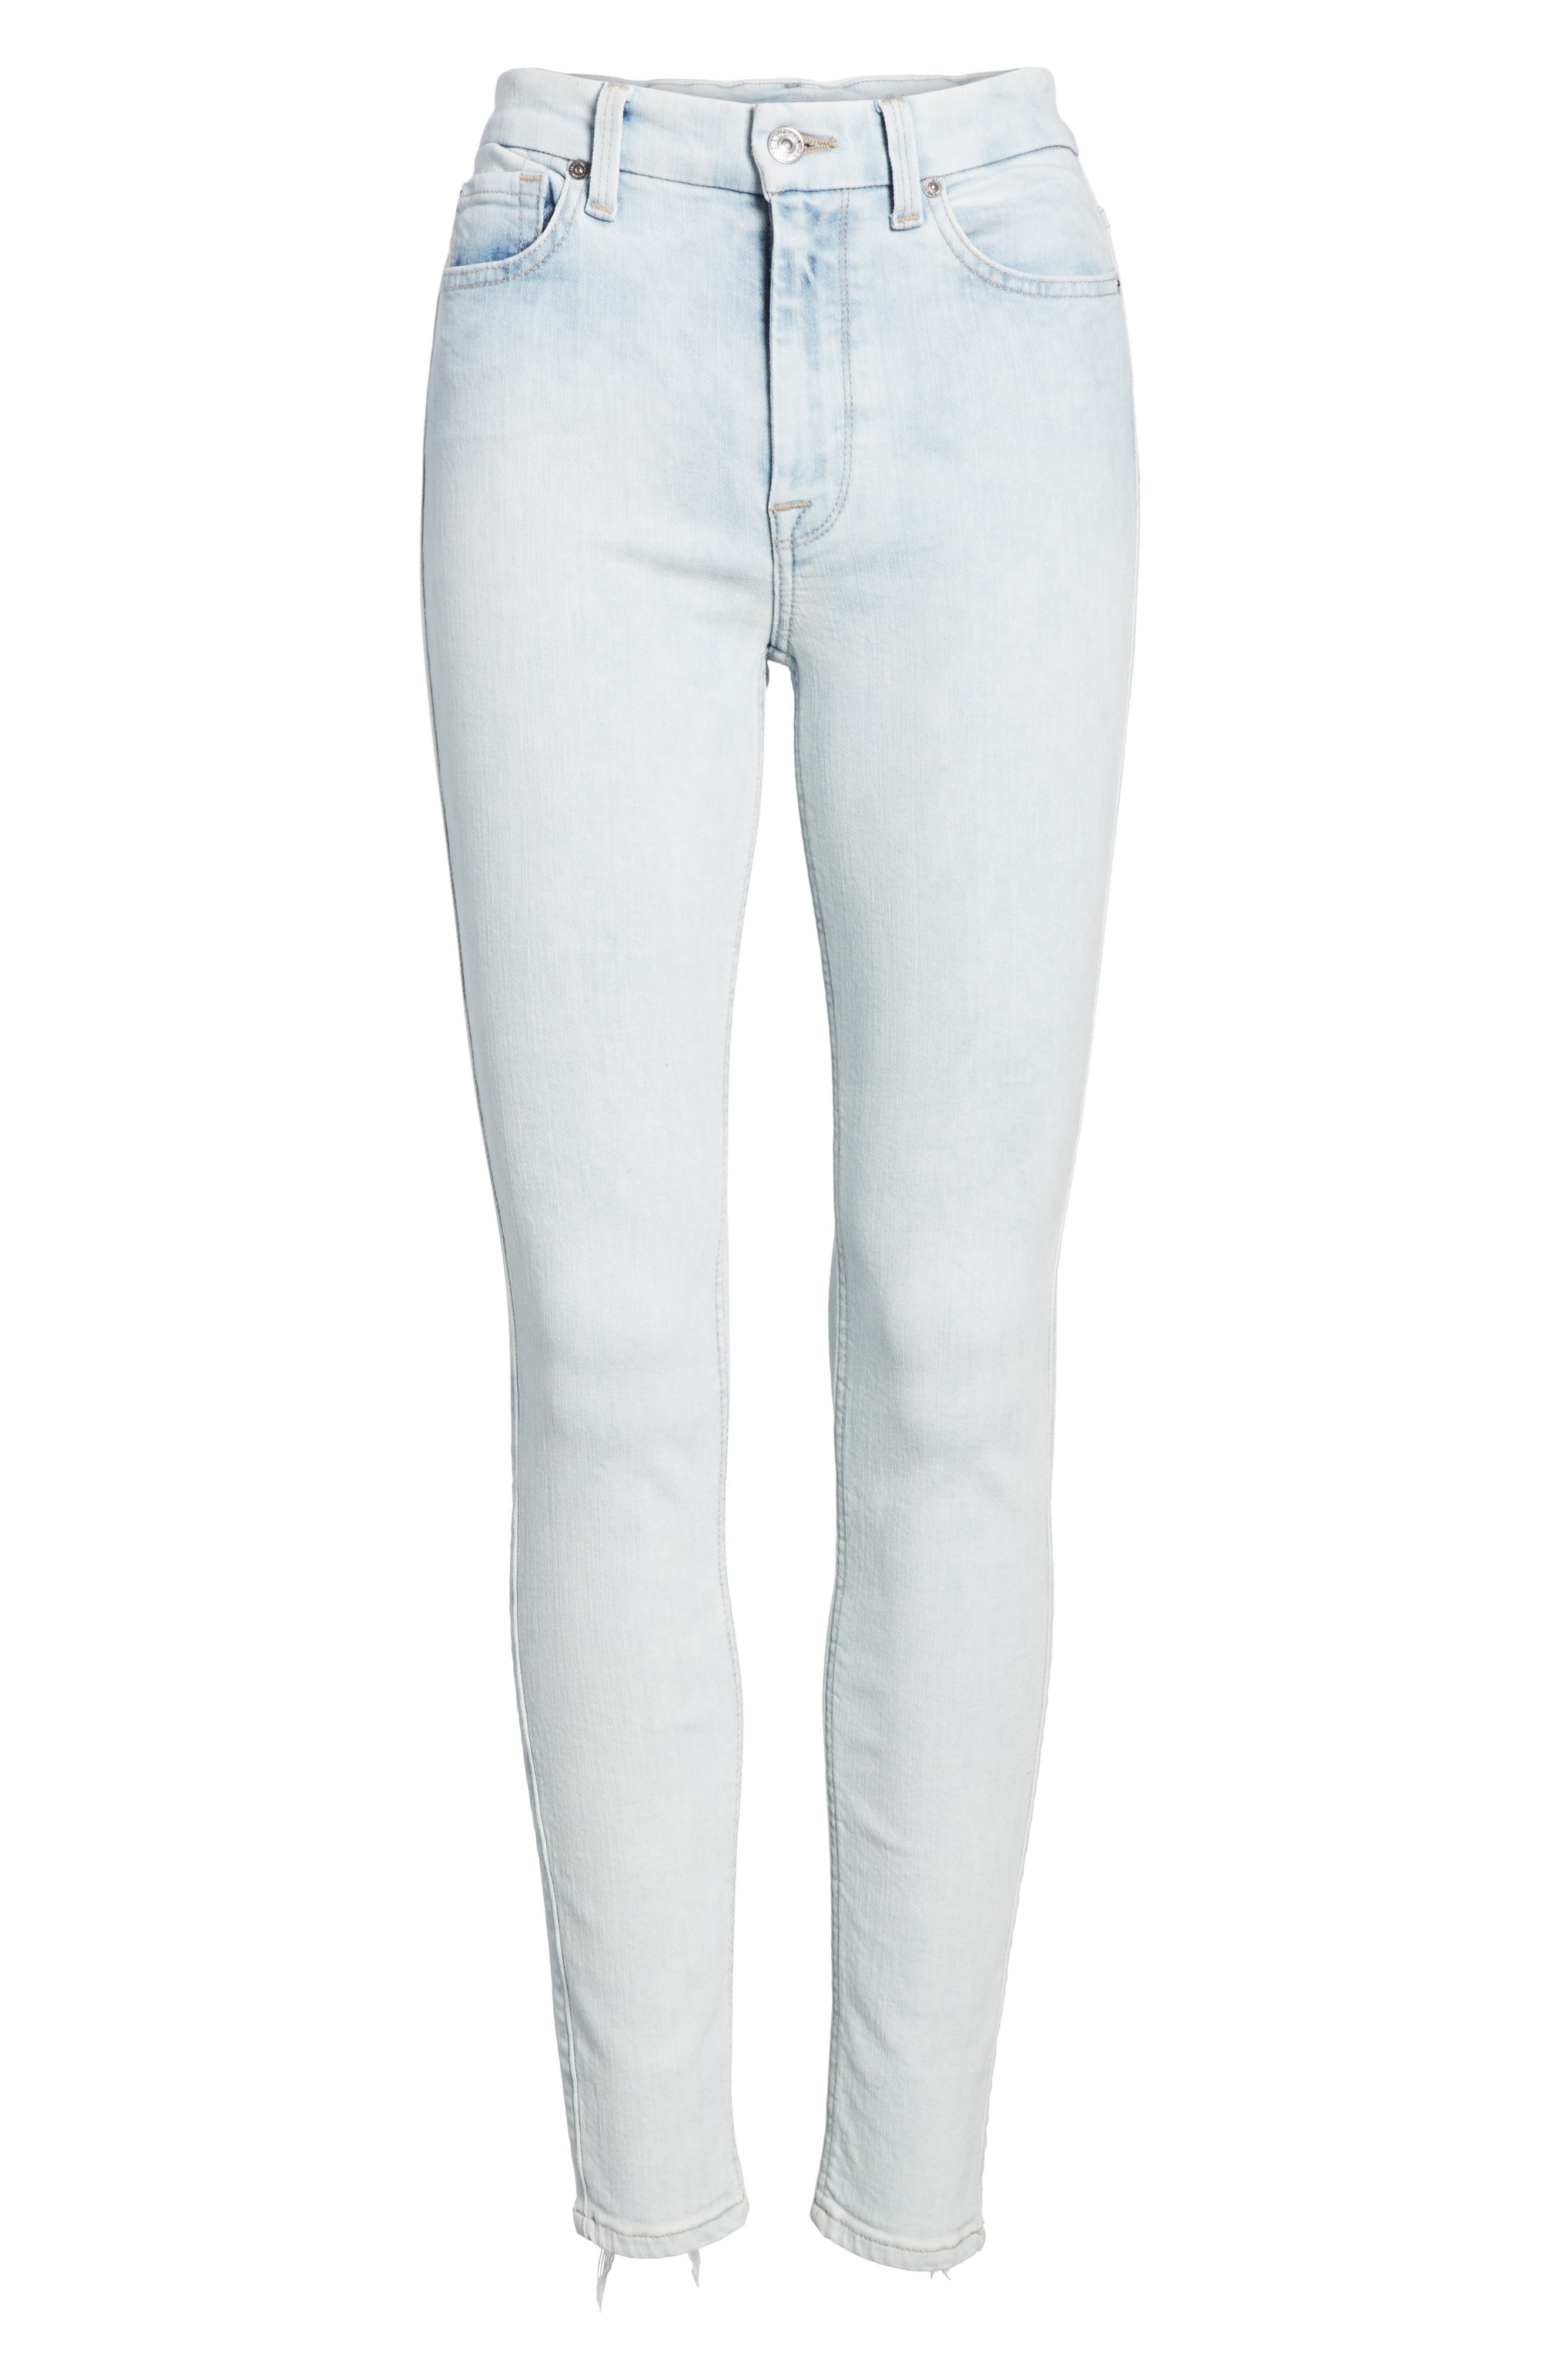 High Waist Ankle Skinny Jeans,                             Alternate thumbnail 6, color,                             401